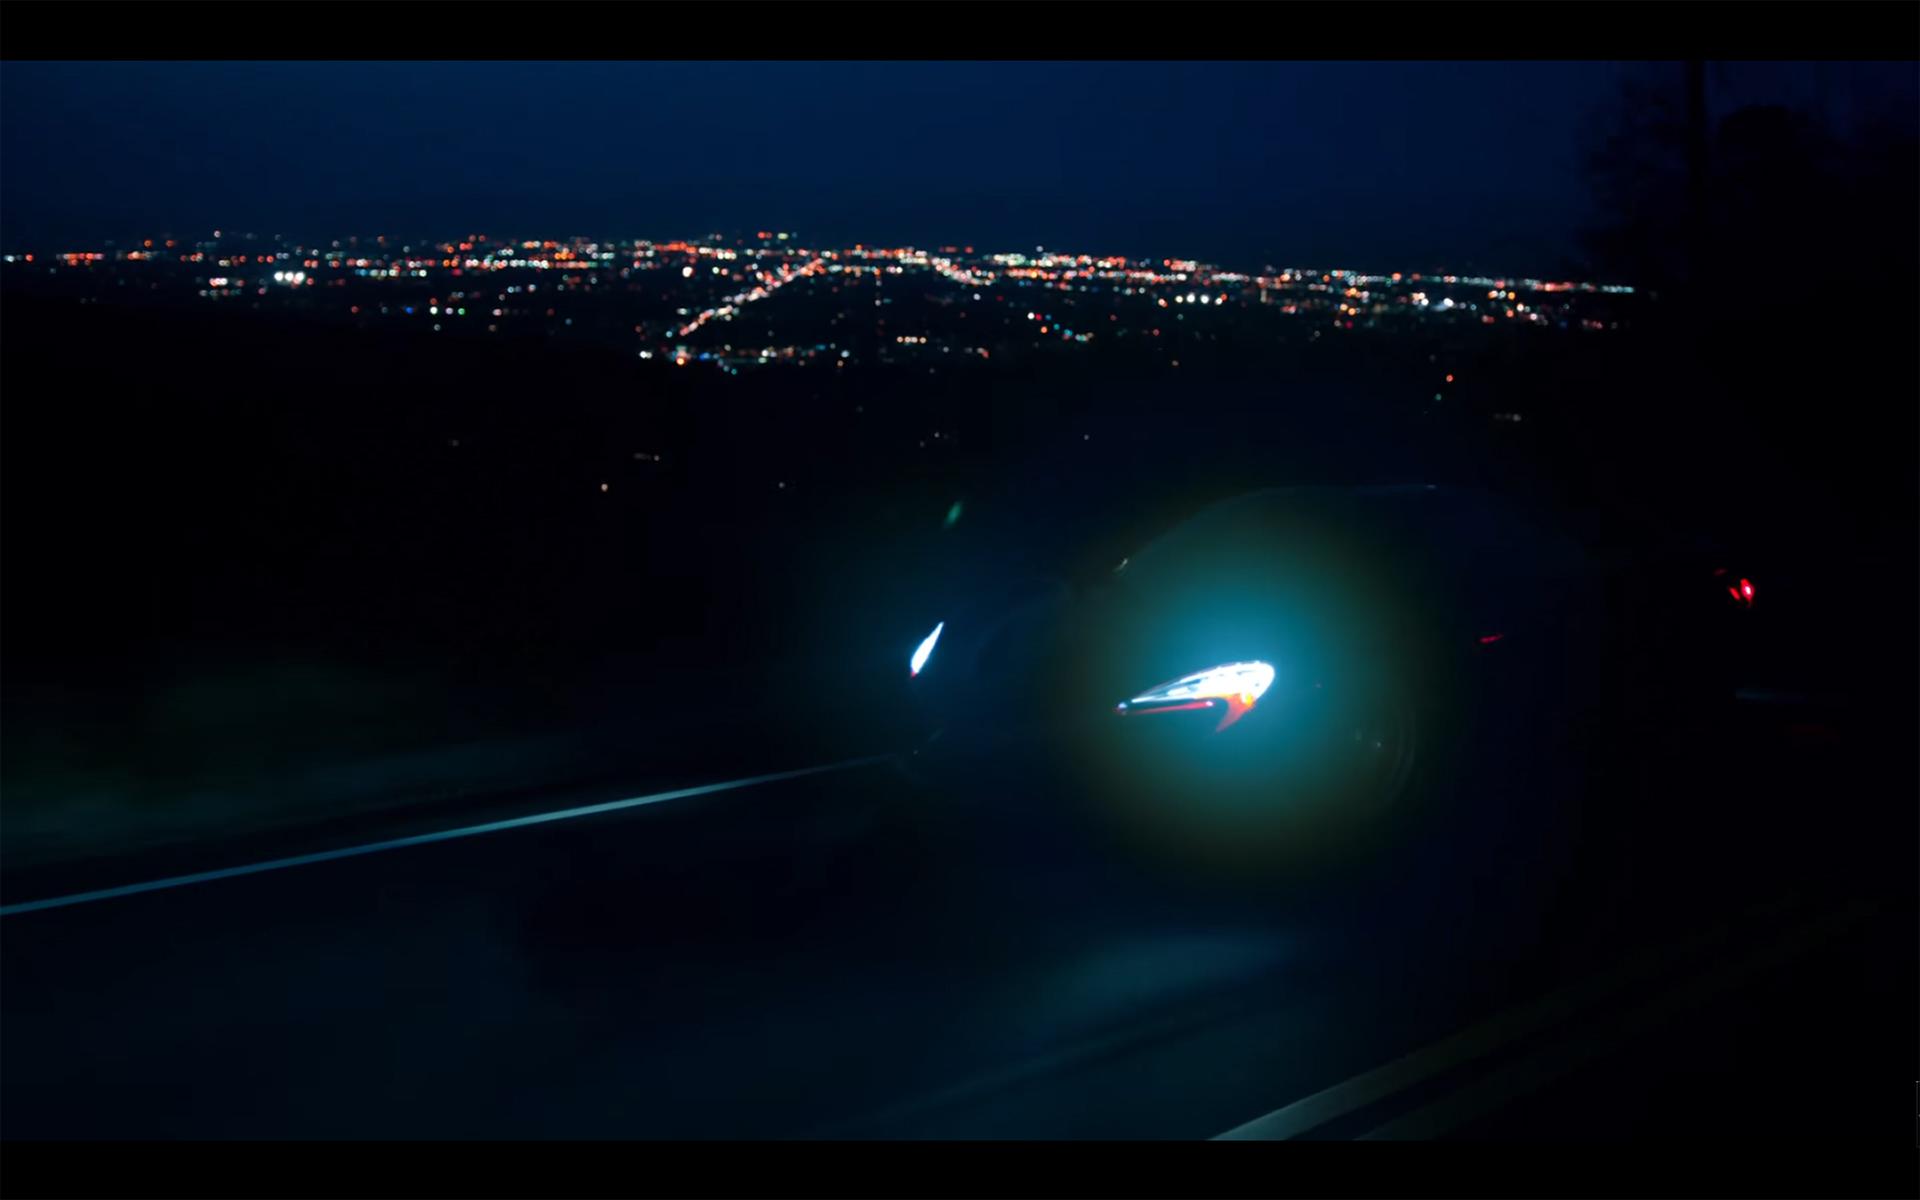 Starboy - The Weeknd - McLaren P1 - driving roads hills - front lights